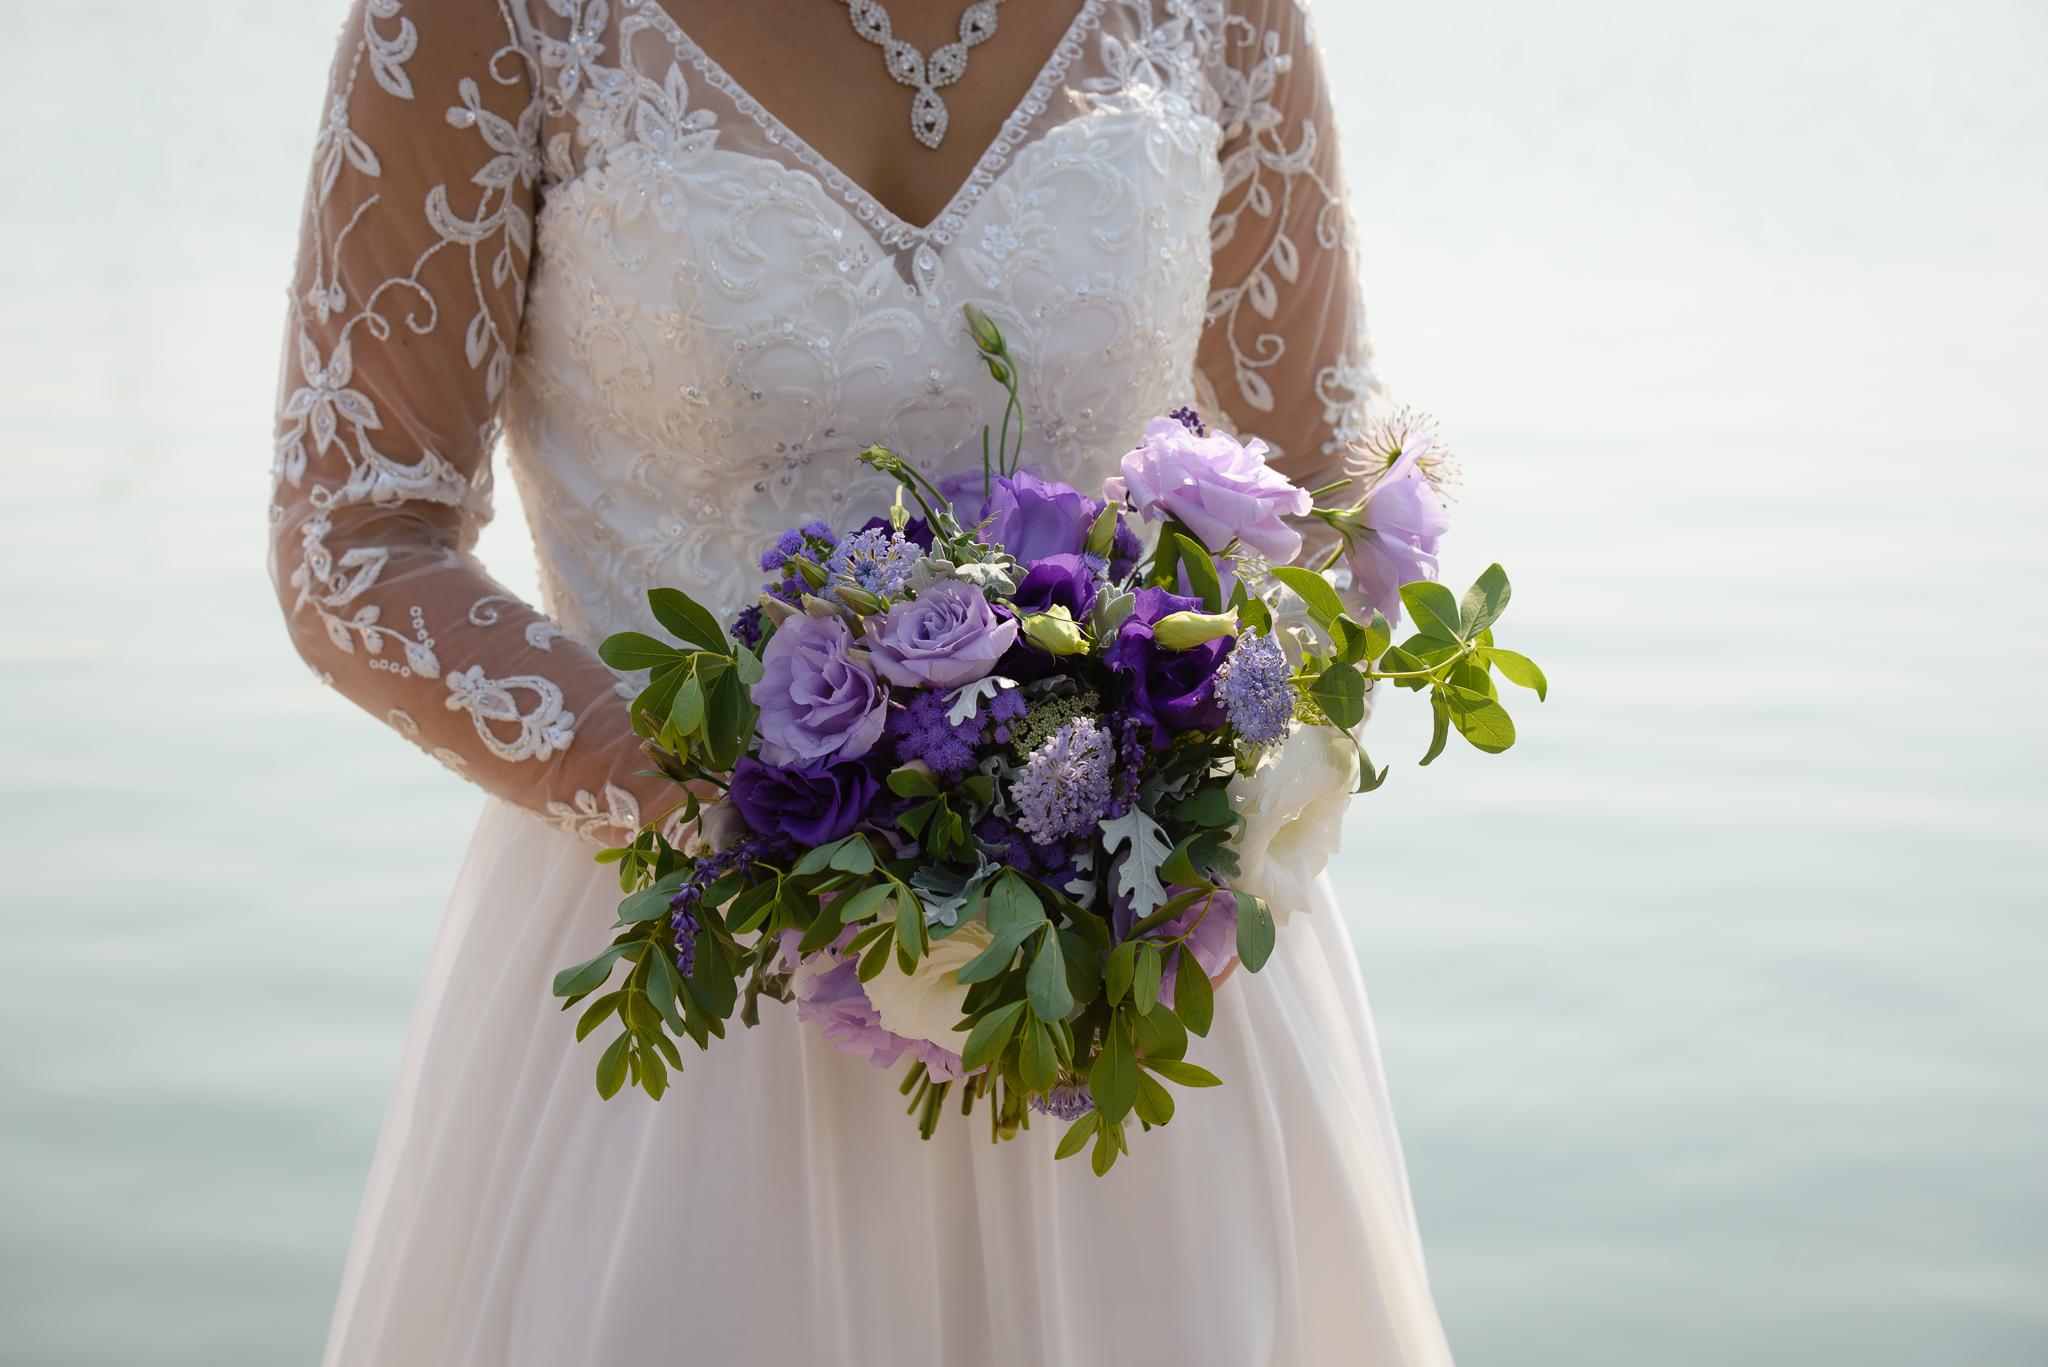 27-ashland washburn wedding photographyDSC_4236.jpg